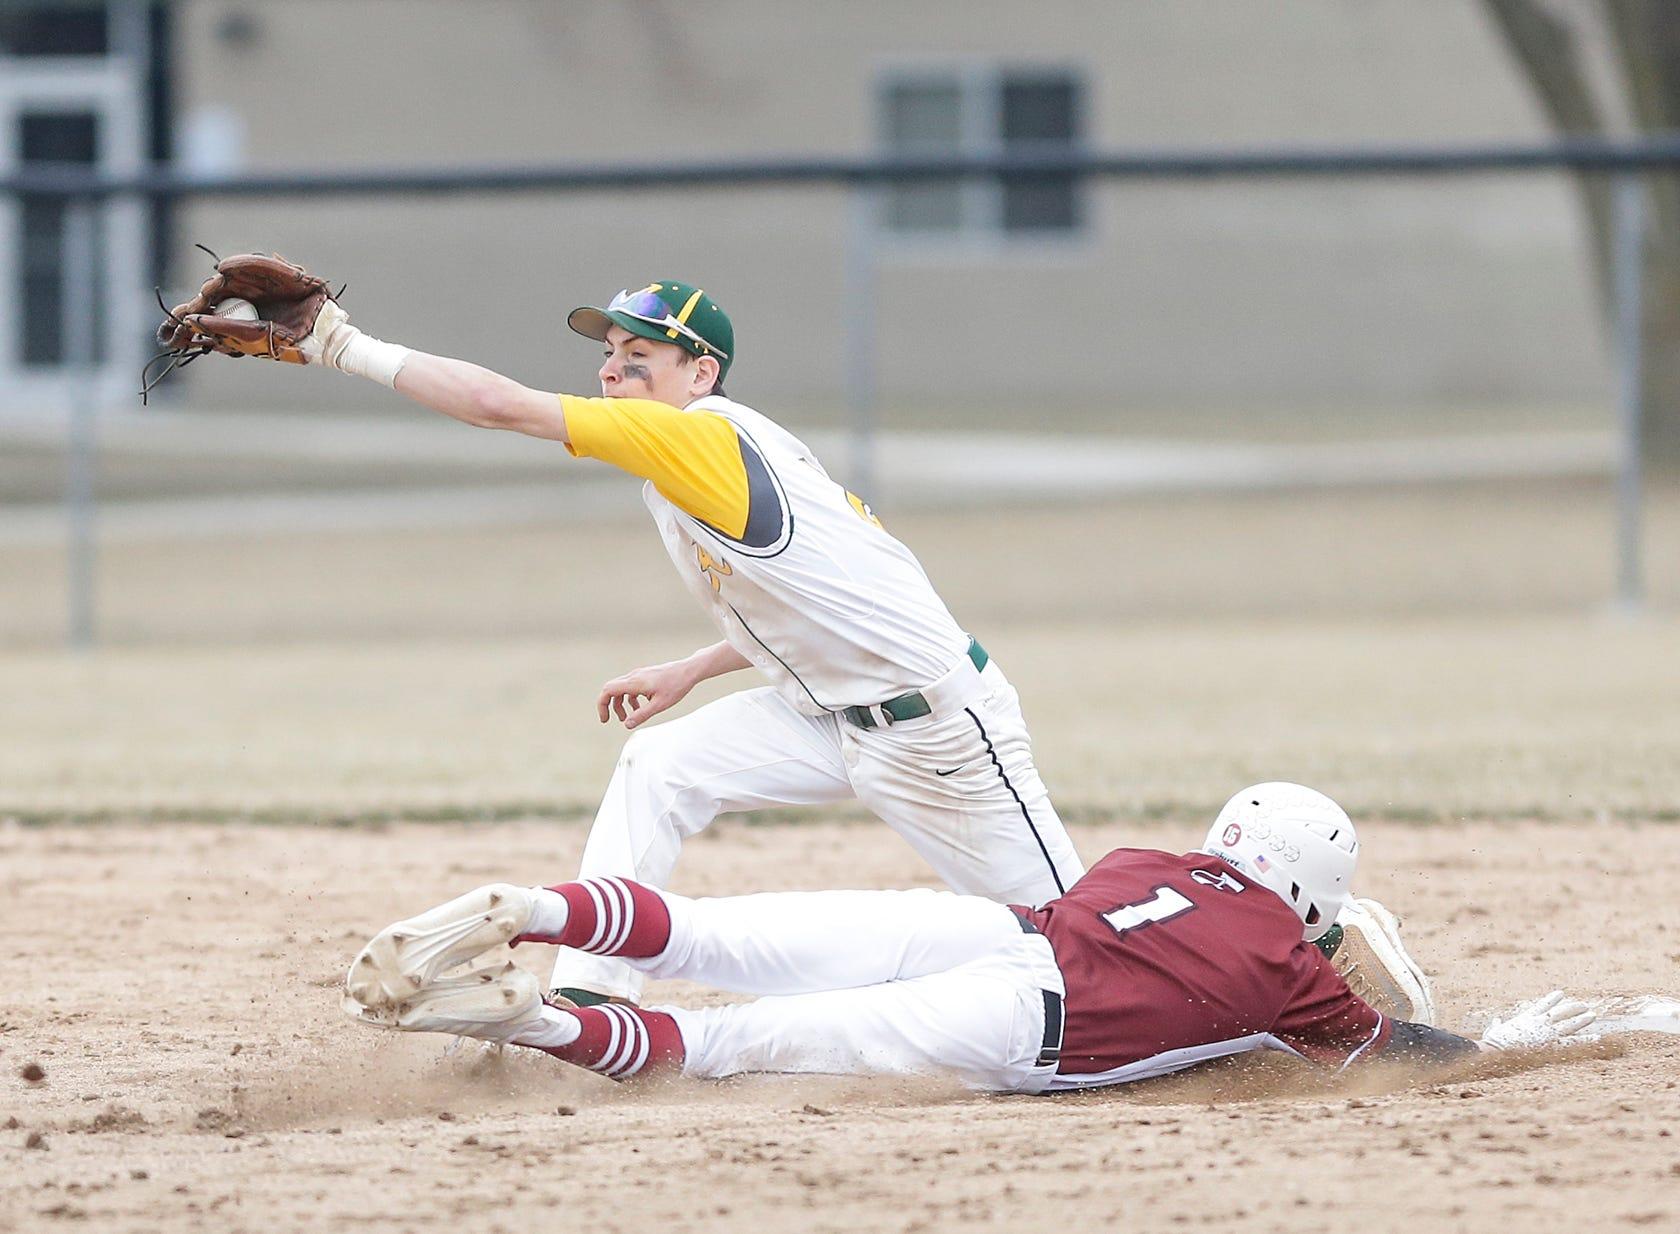 Fond du Lac High School baseball's Caden Krug (1) steals second base as Ashwaubenon High School's Ian MacLean (2) catches the ball Saturday, April 6, 2019 during their game in Fond du Lac, Wis. Fond du Lac won the game 5-3. Doug Raflik/USA TODAY NETWORK-Wisconsin